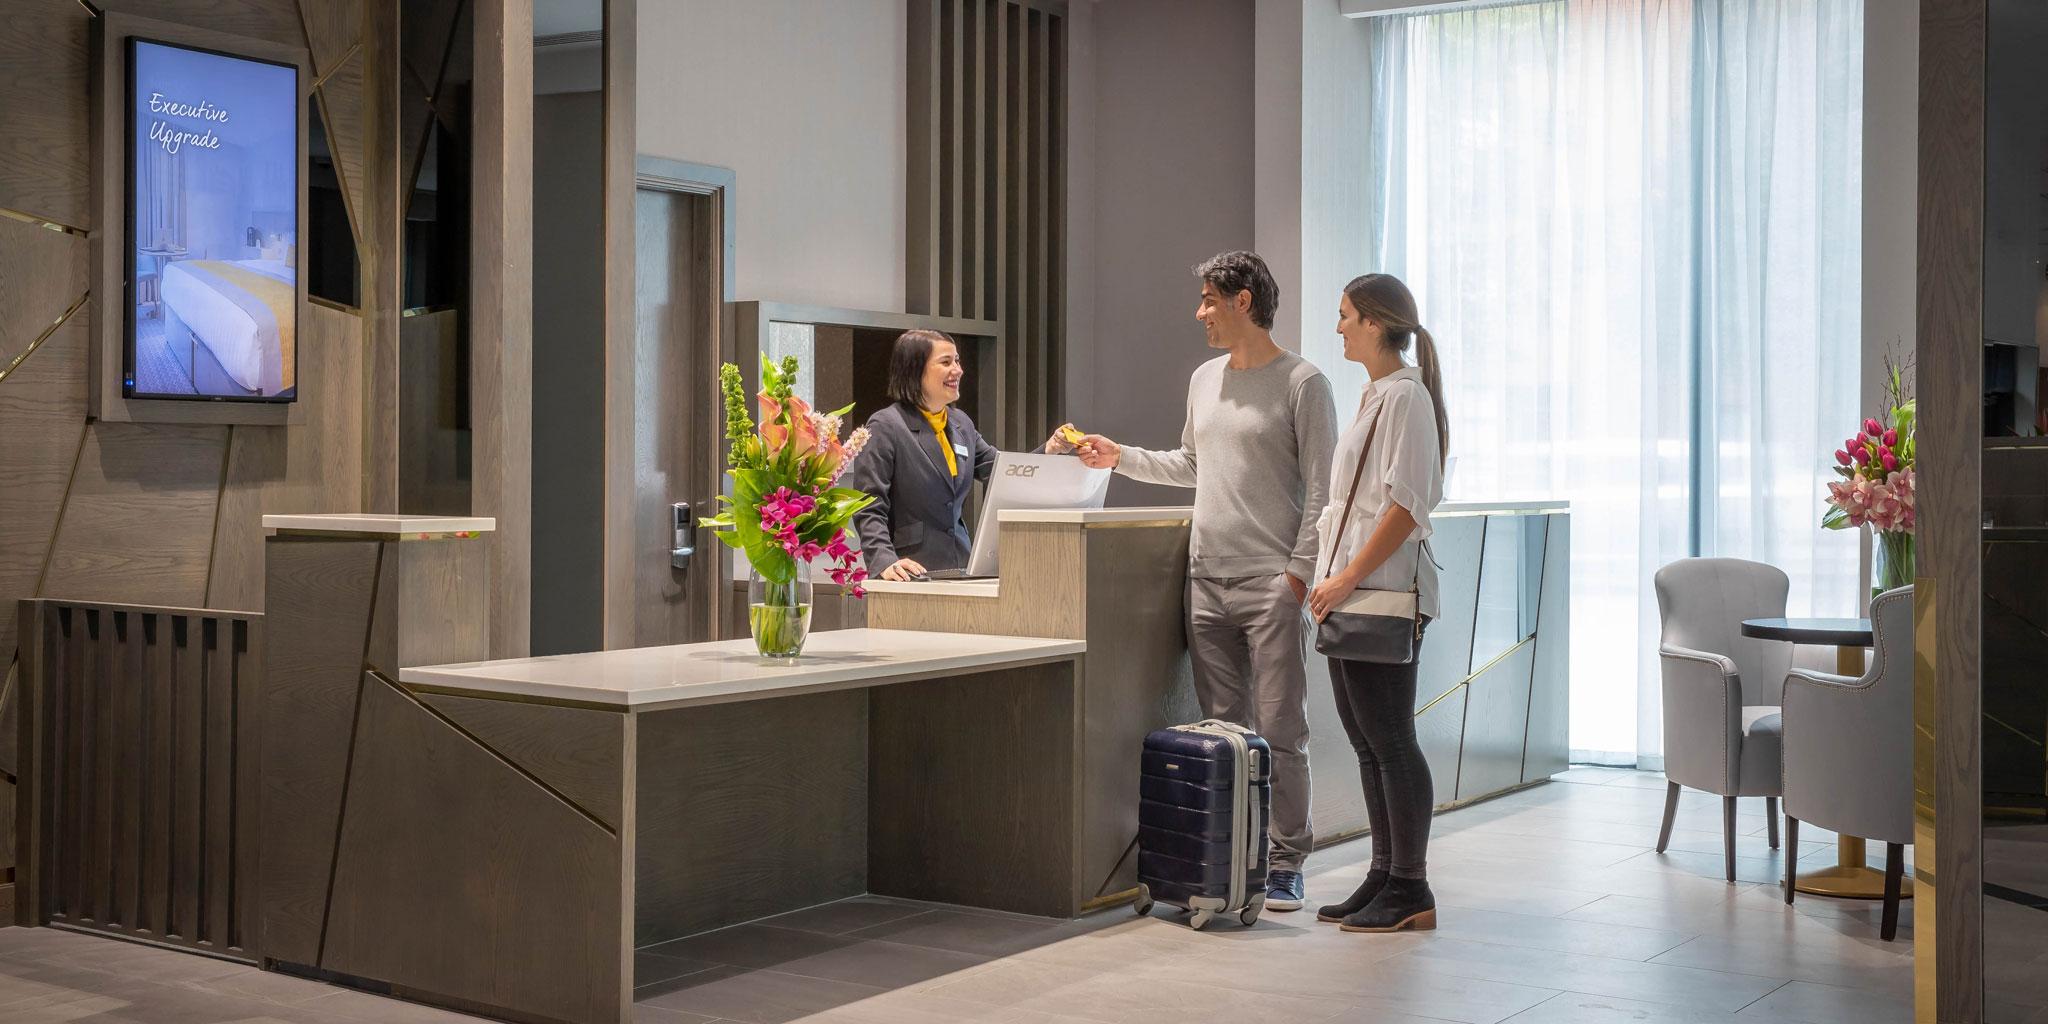 guests-checking-in-reception-Maldron-Hotel-Parnell-Square-Dublin